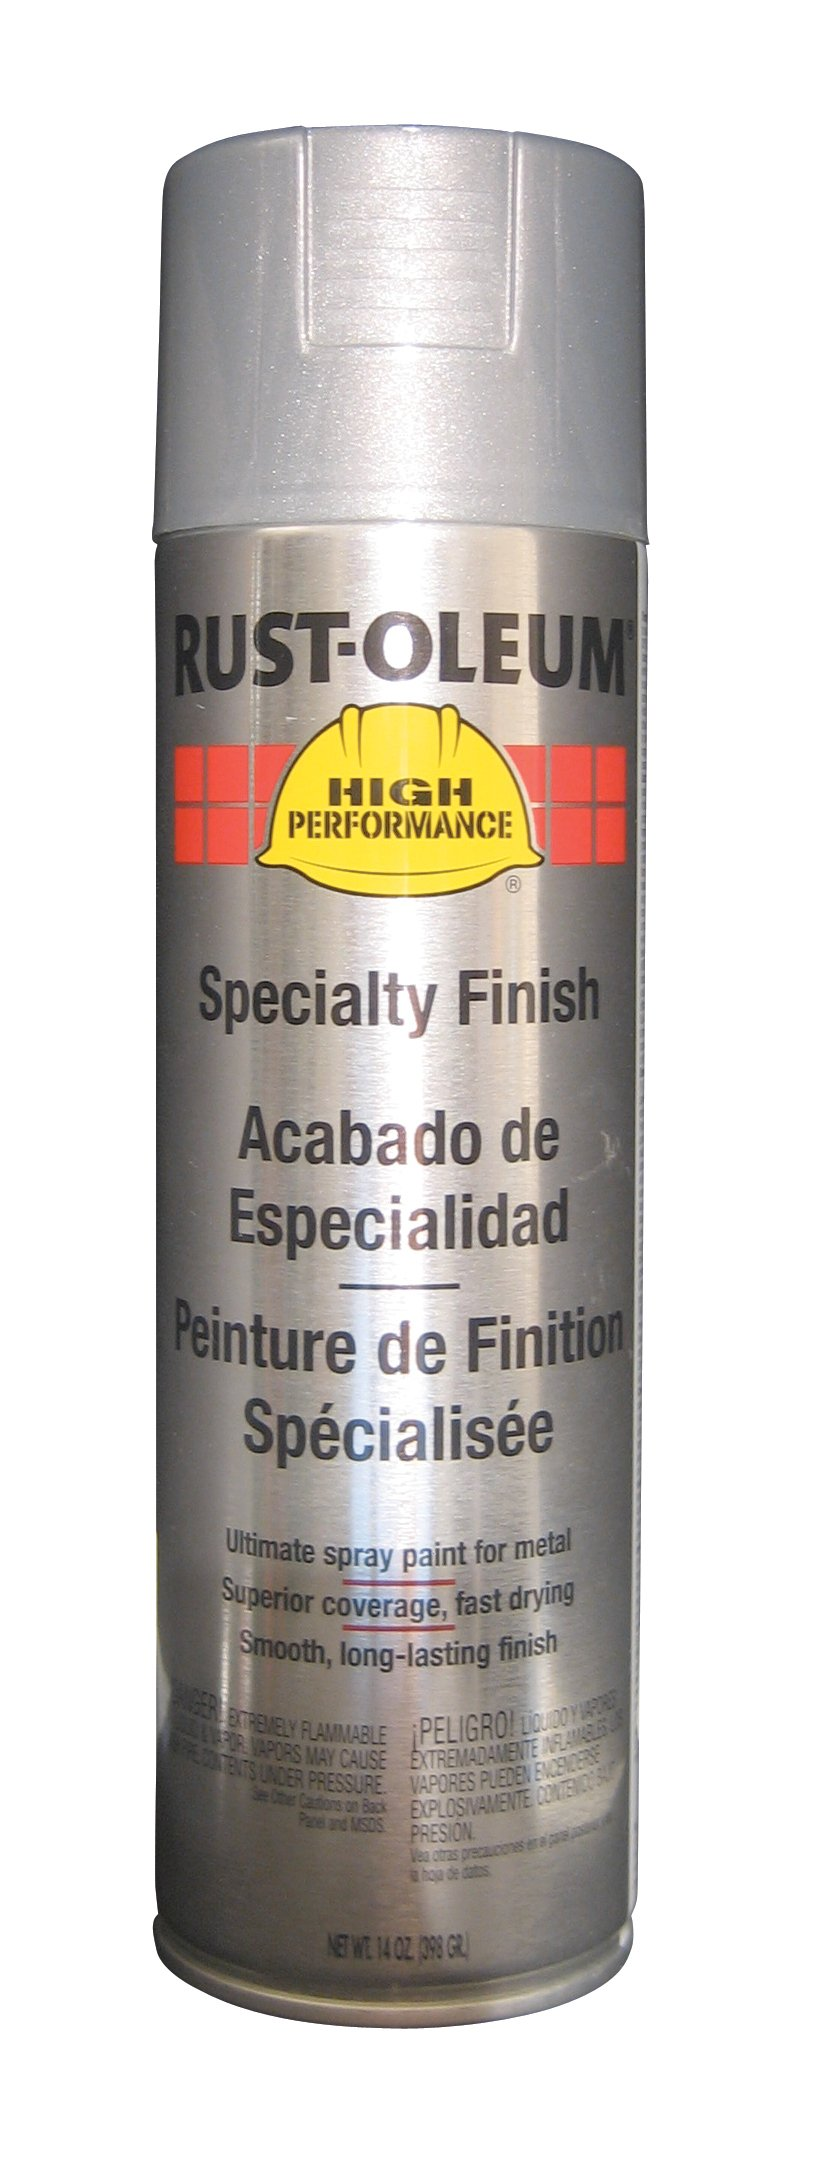 Buy Rust-Oleum 7581838 Professional High Performance Enamel Spray